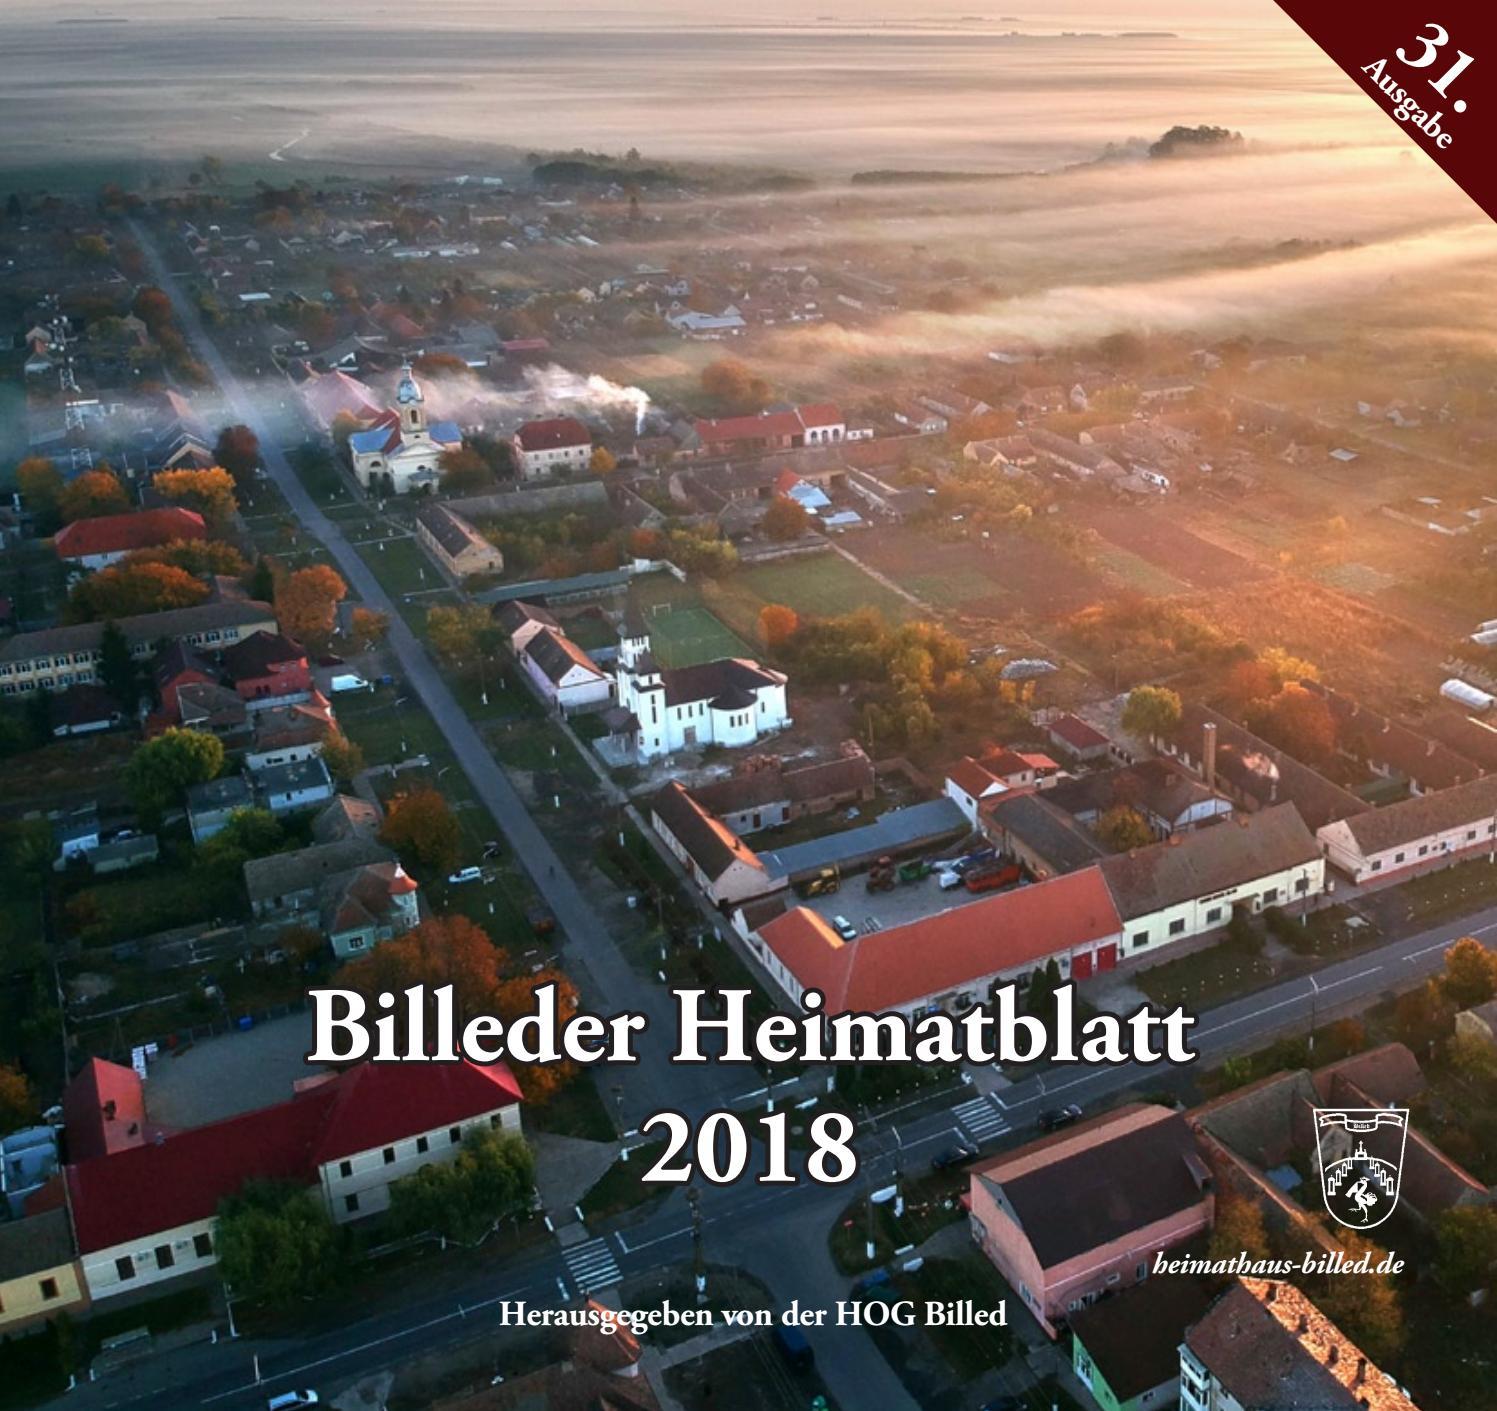 Billeder Heimatblatt 2018 By Hog Billed Issuu